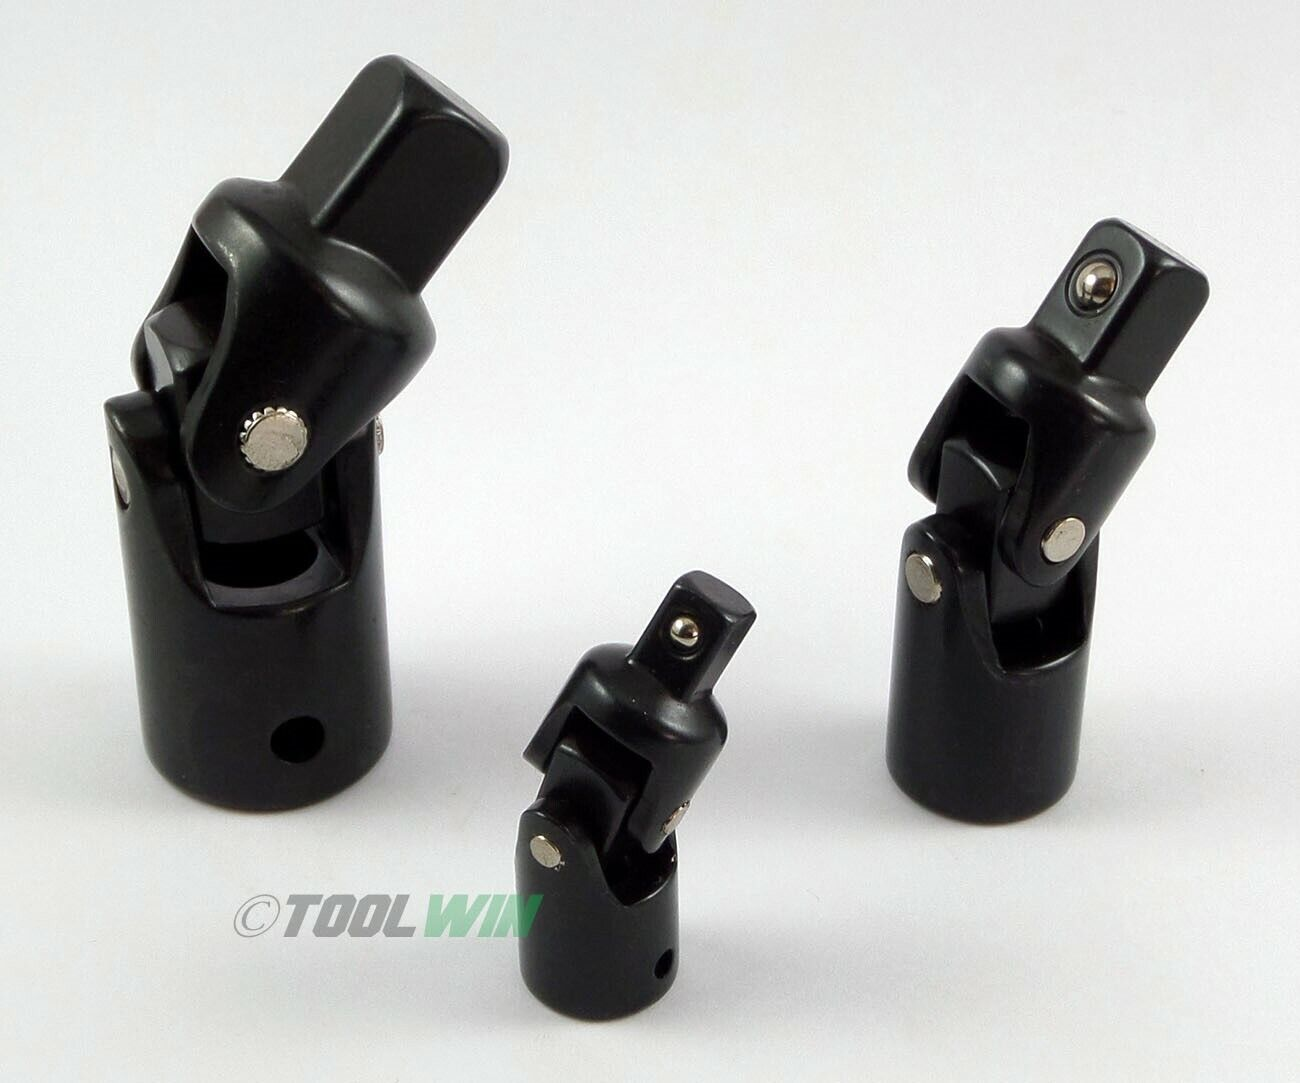 00788 toolwin 3pc Impact Swivel Universal Joint Air Impact Socket Set 1/4 3/8 1/2